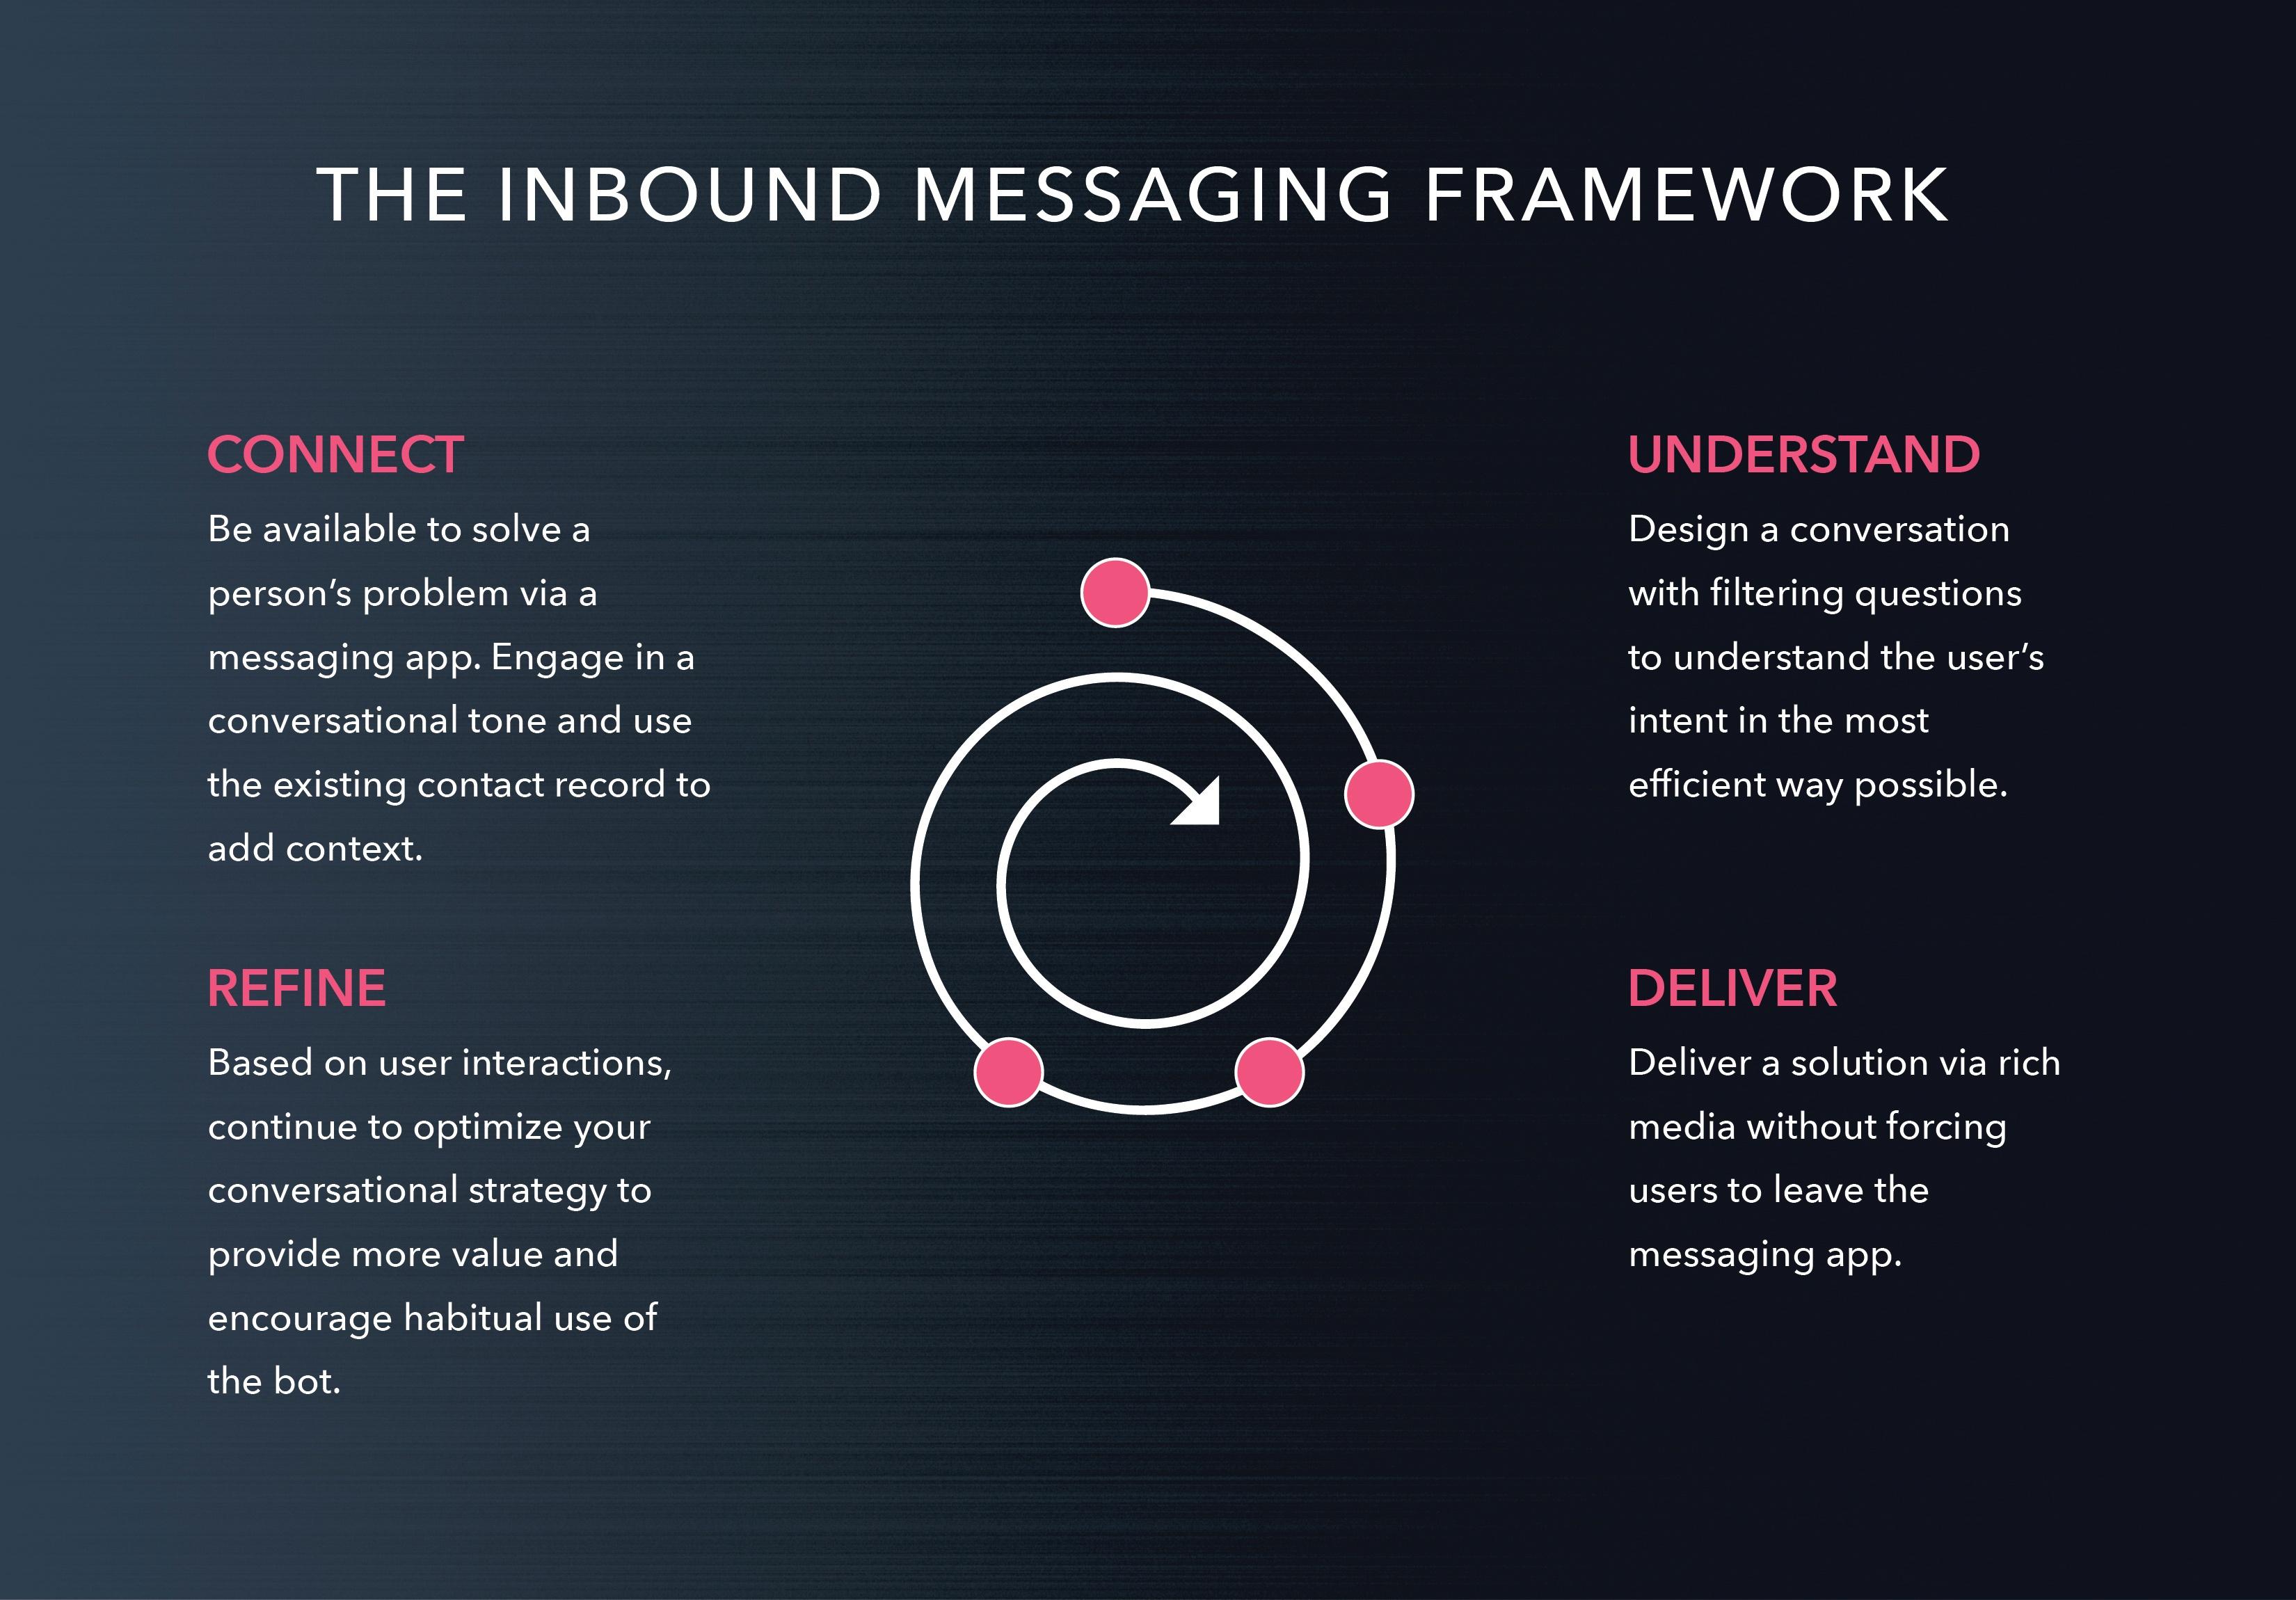 MessagingFramework-01-2.jpg